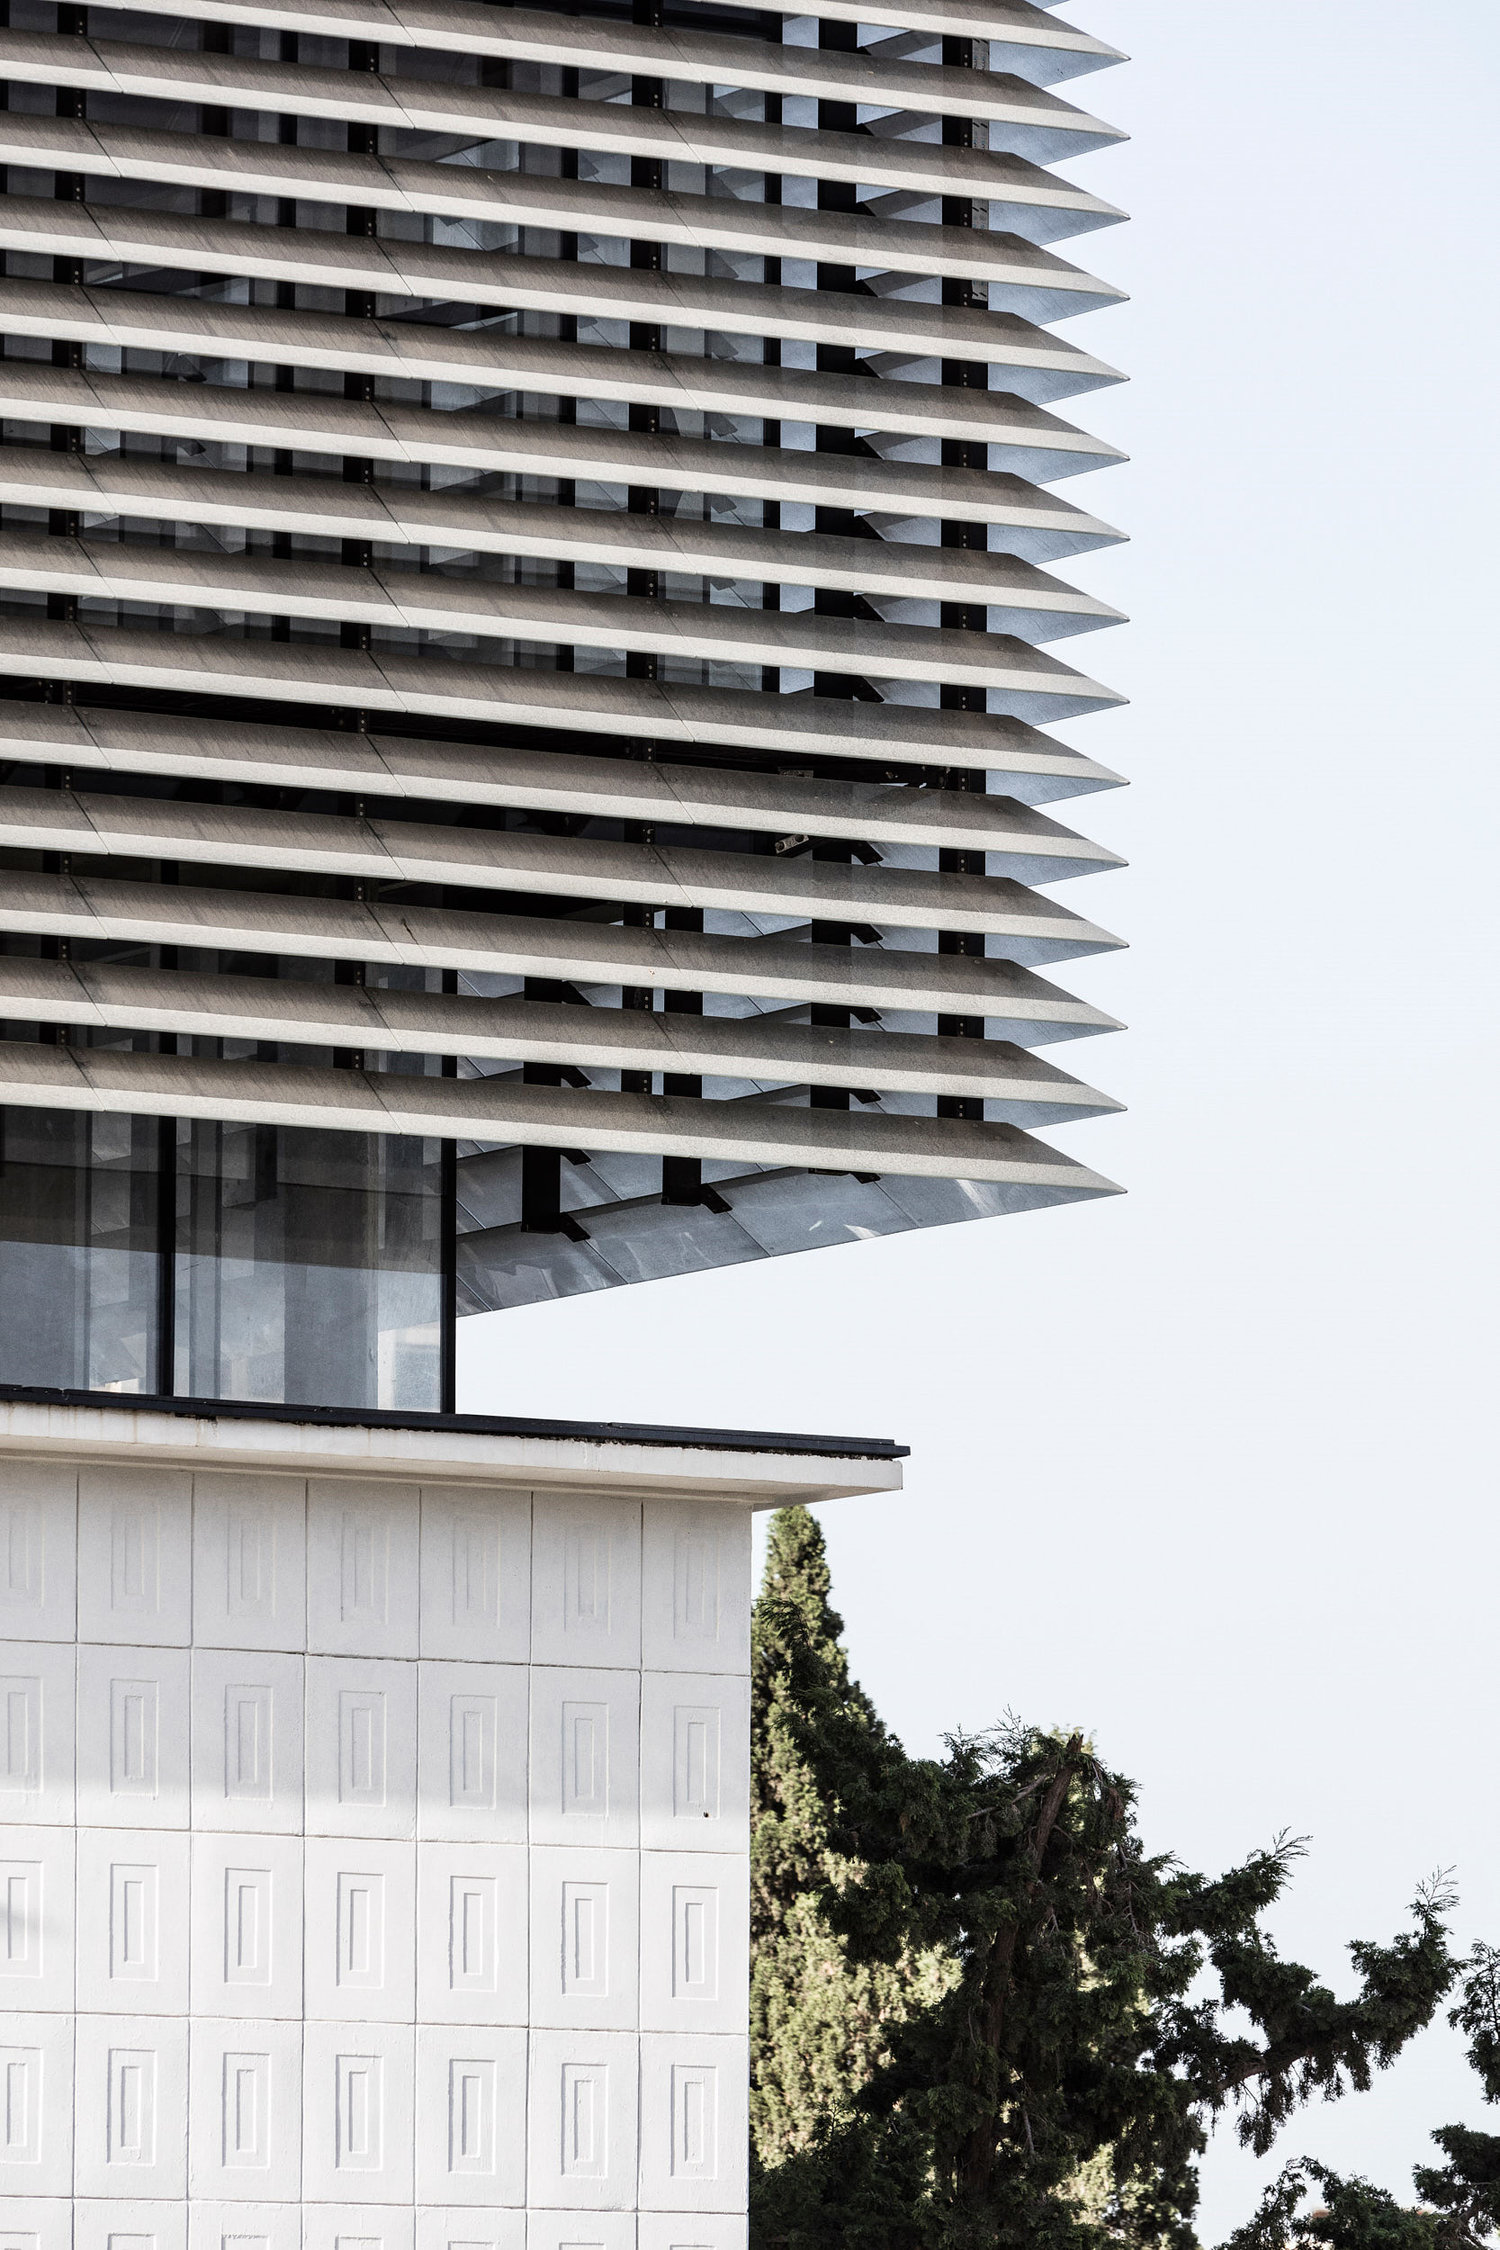 Farmer's House, 8 Eliezer Kaplan st. by Bar Orian Architects — Images courtesy of Bar Orian Architects